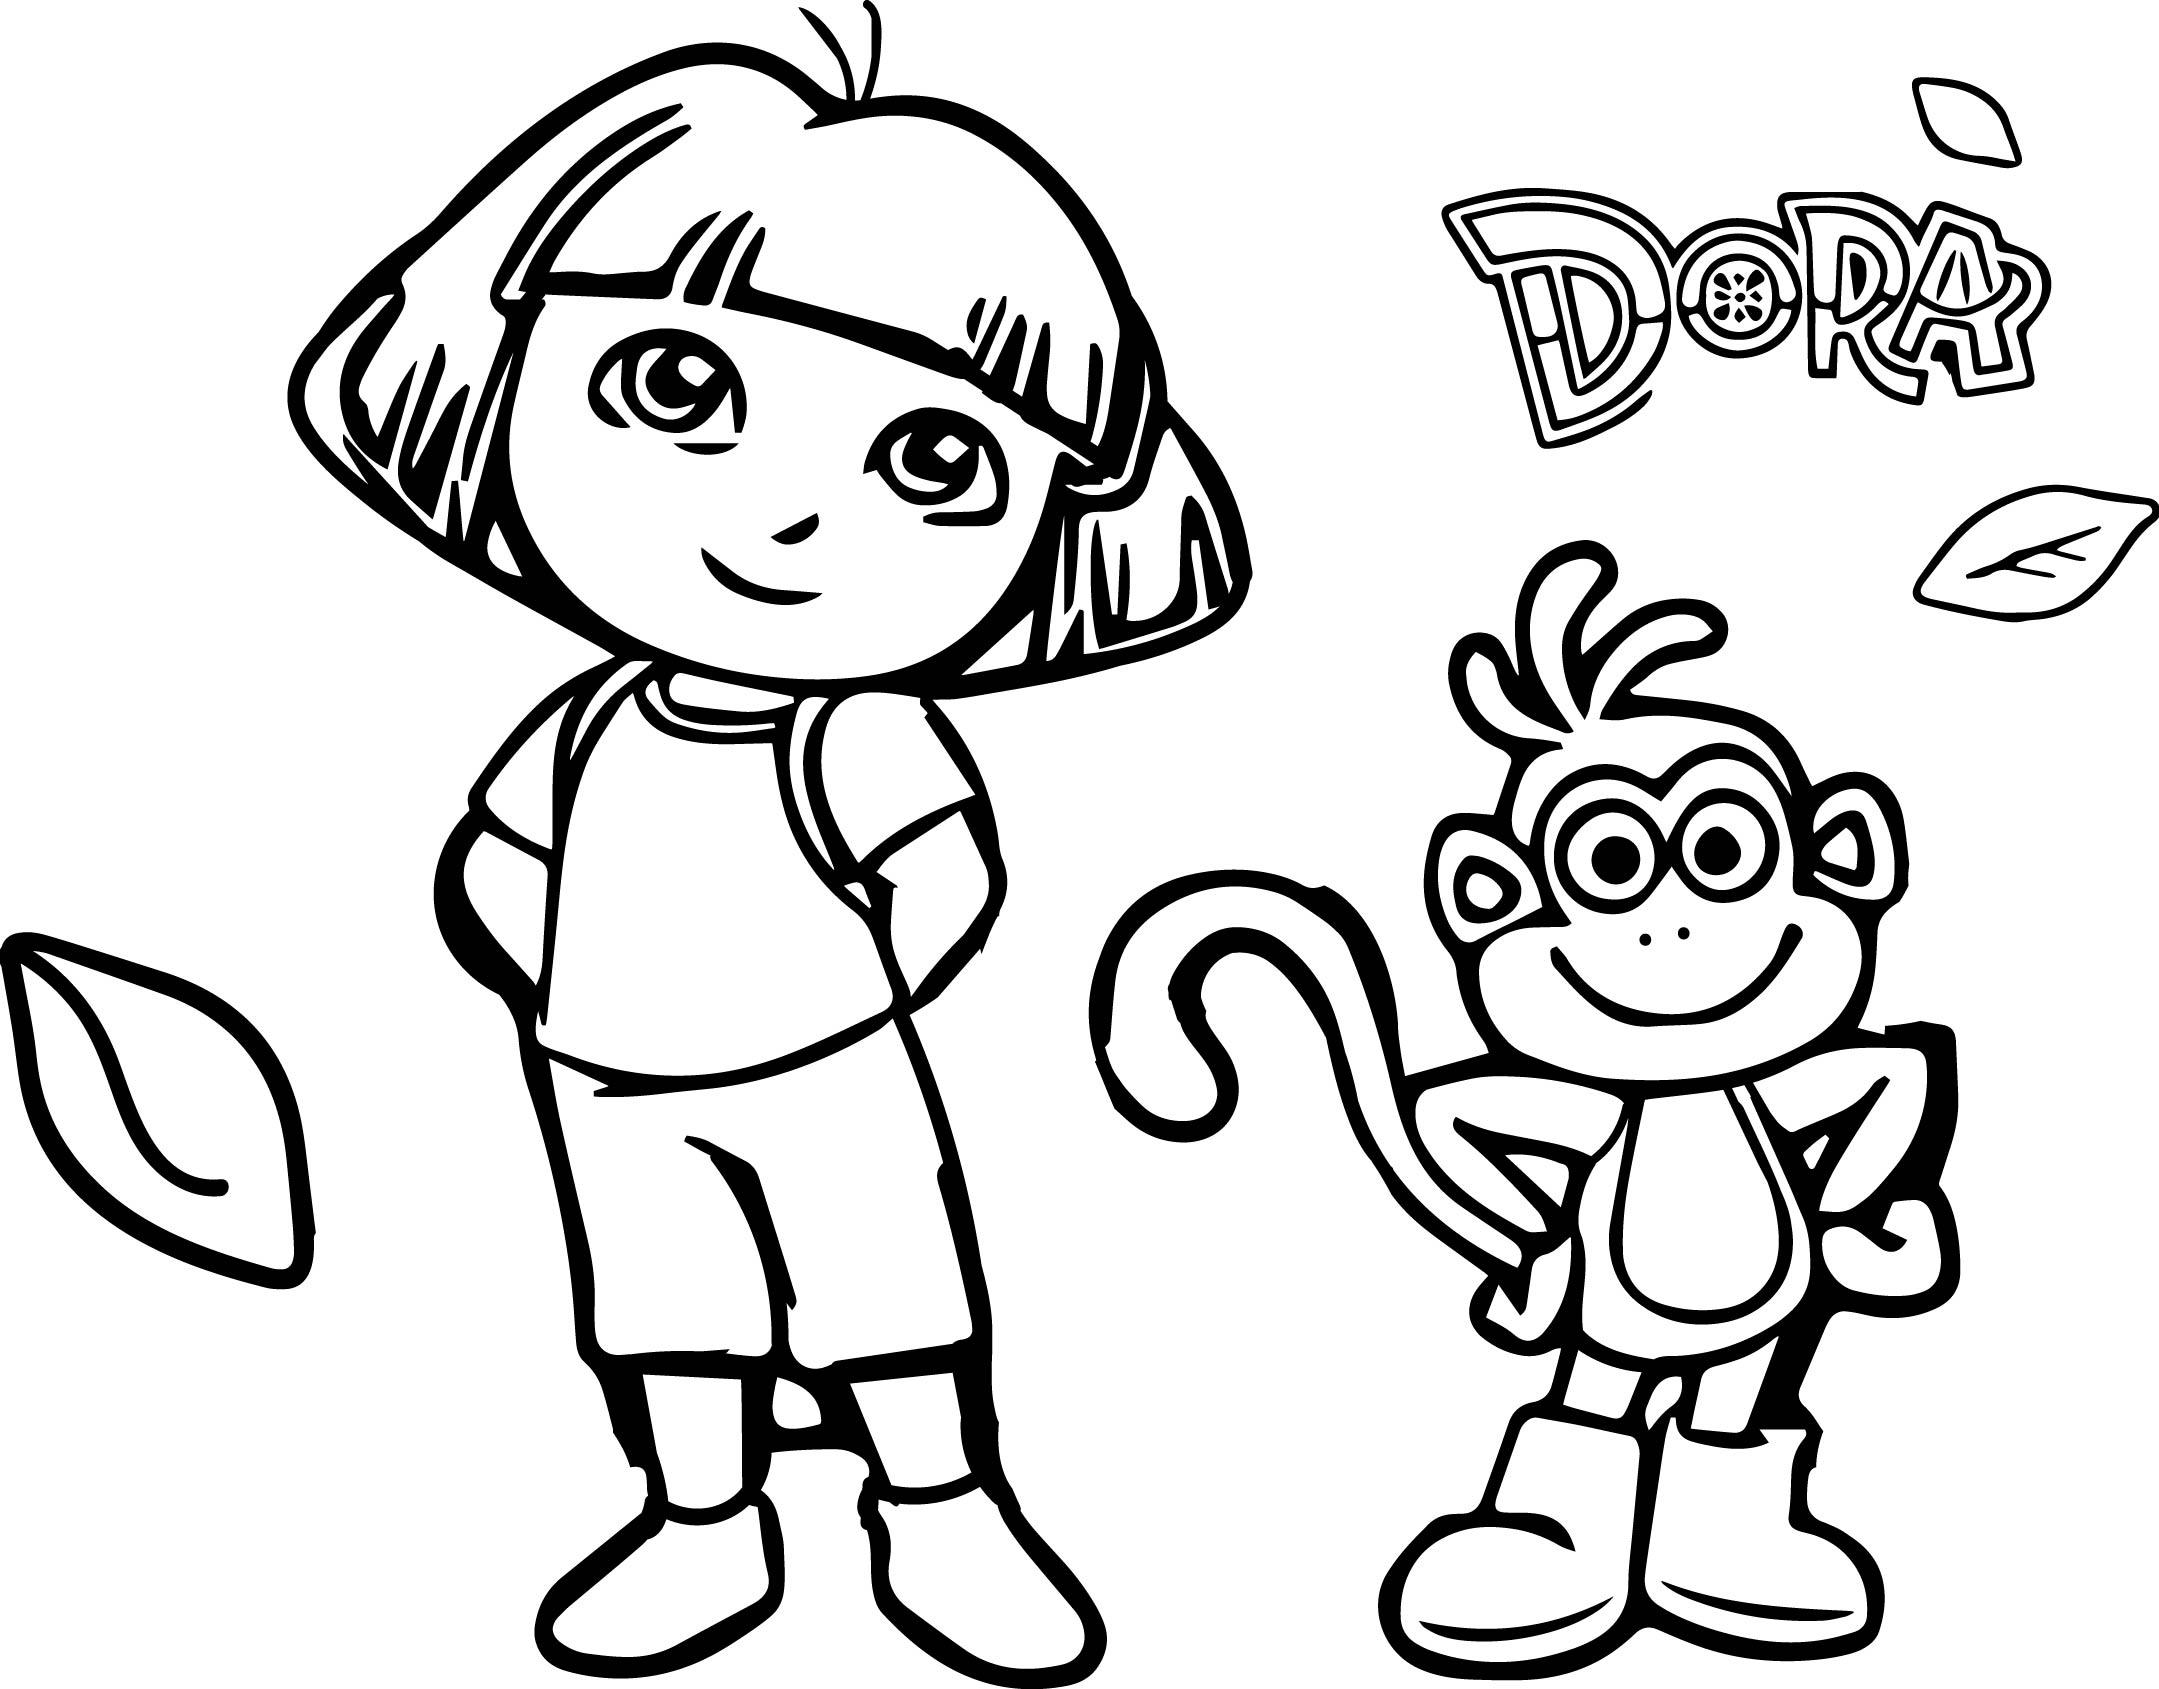 Property Header Dora The Explorer Desktop Portrait Coloring Page